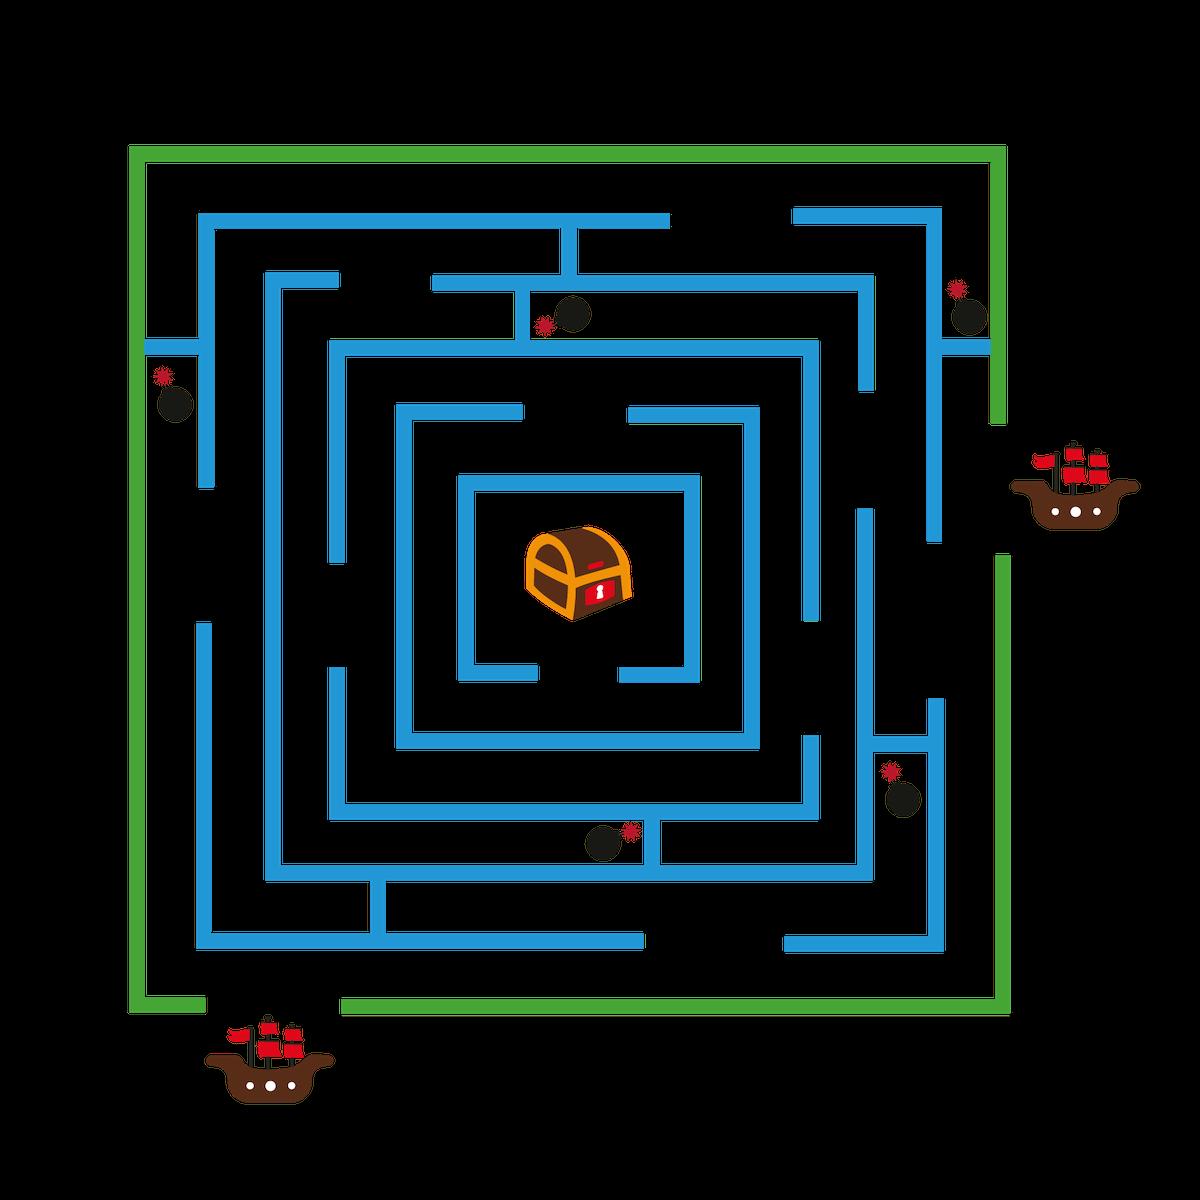 Playground Marking Pirate Maze